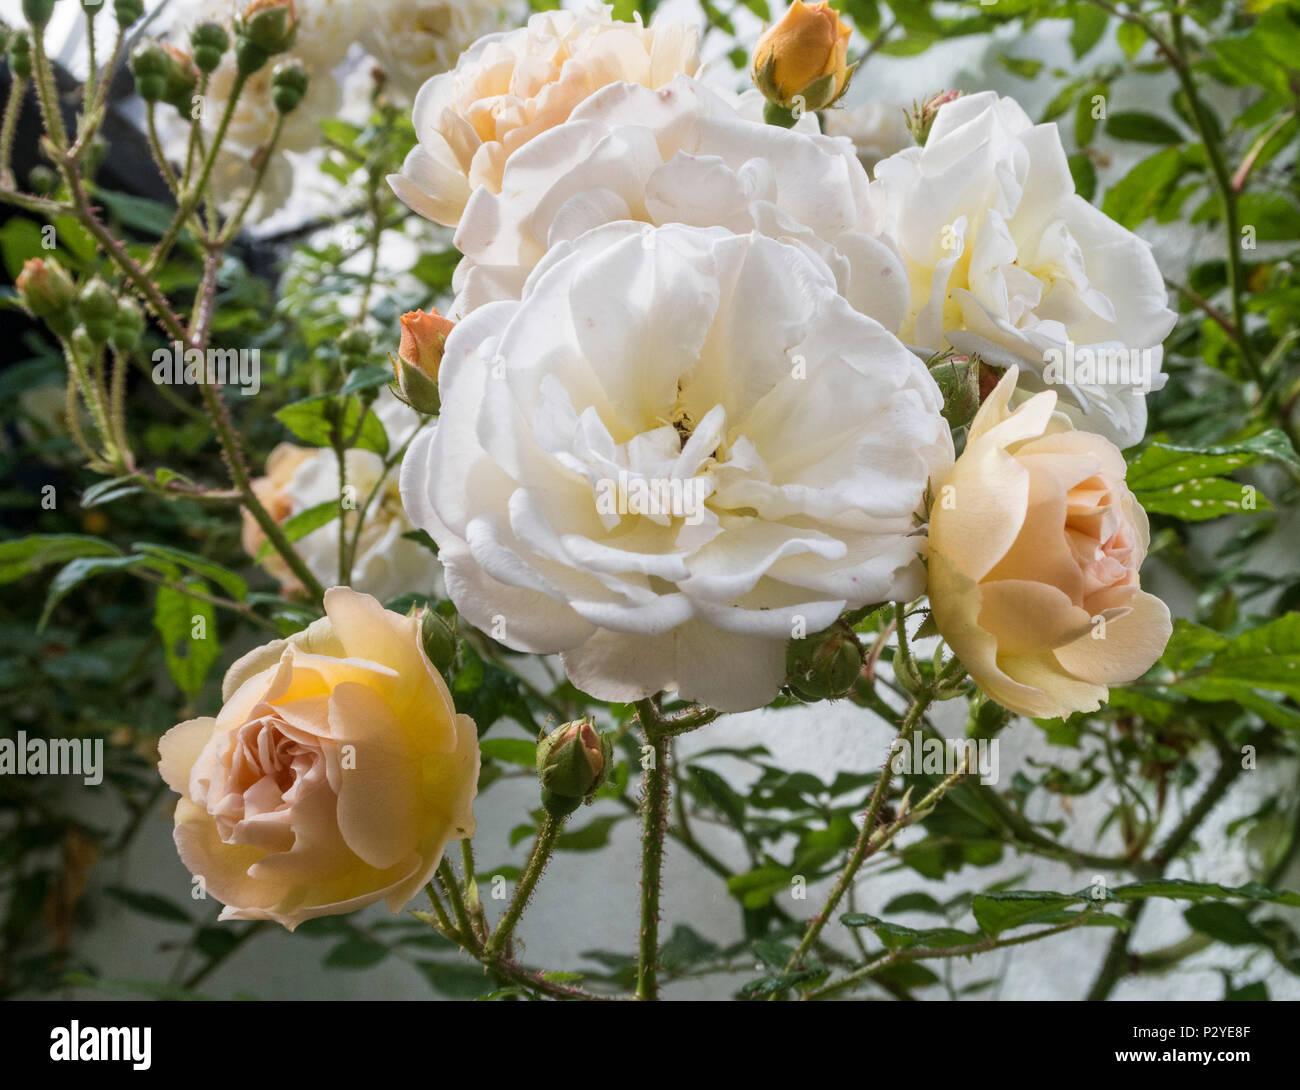 Rose 'Ghislaine de Feligonde', a Musk Rambling Rose. Fragrant semi double white /apricot blooms. In bud and flower. Rosa. - Stock Image